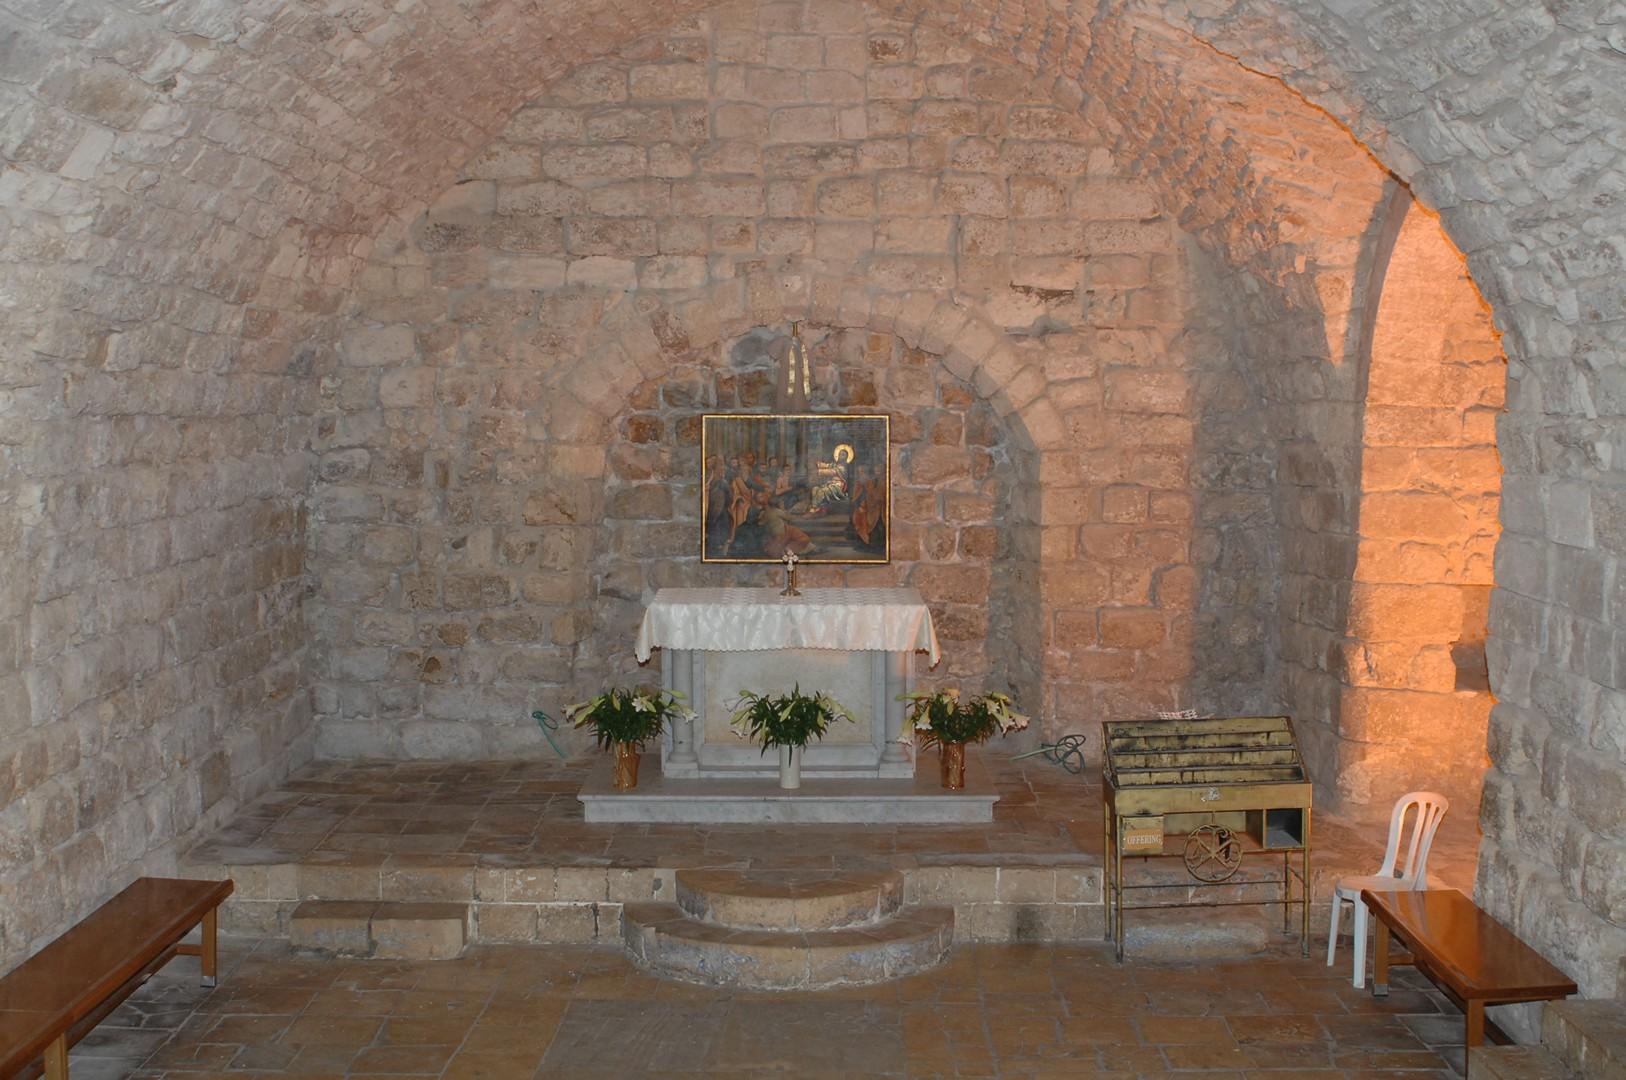 The Synagogue Church